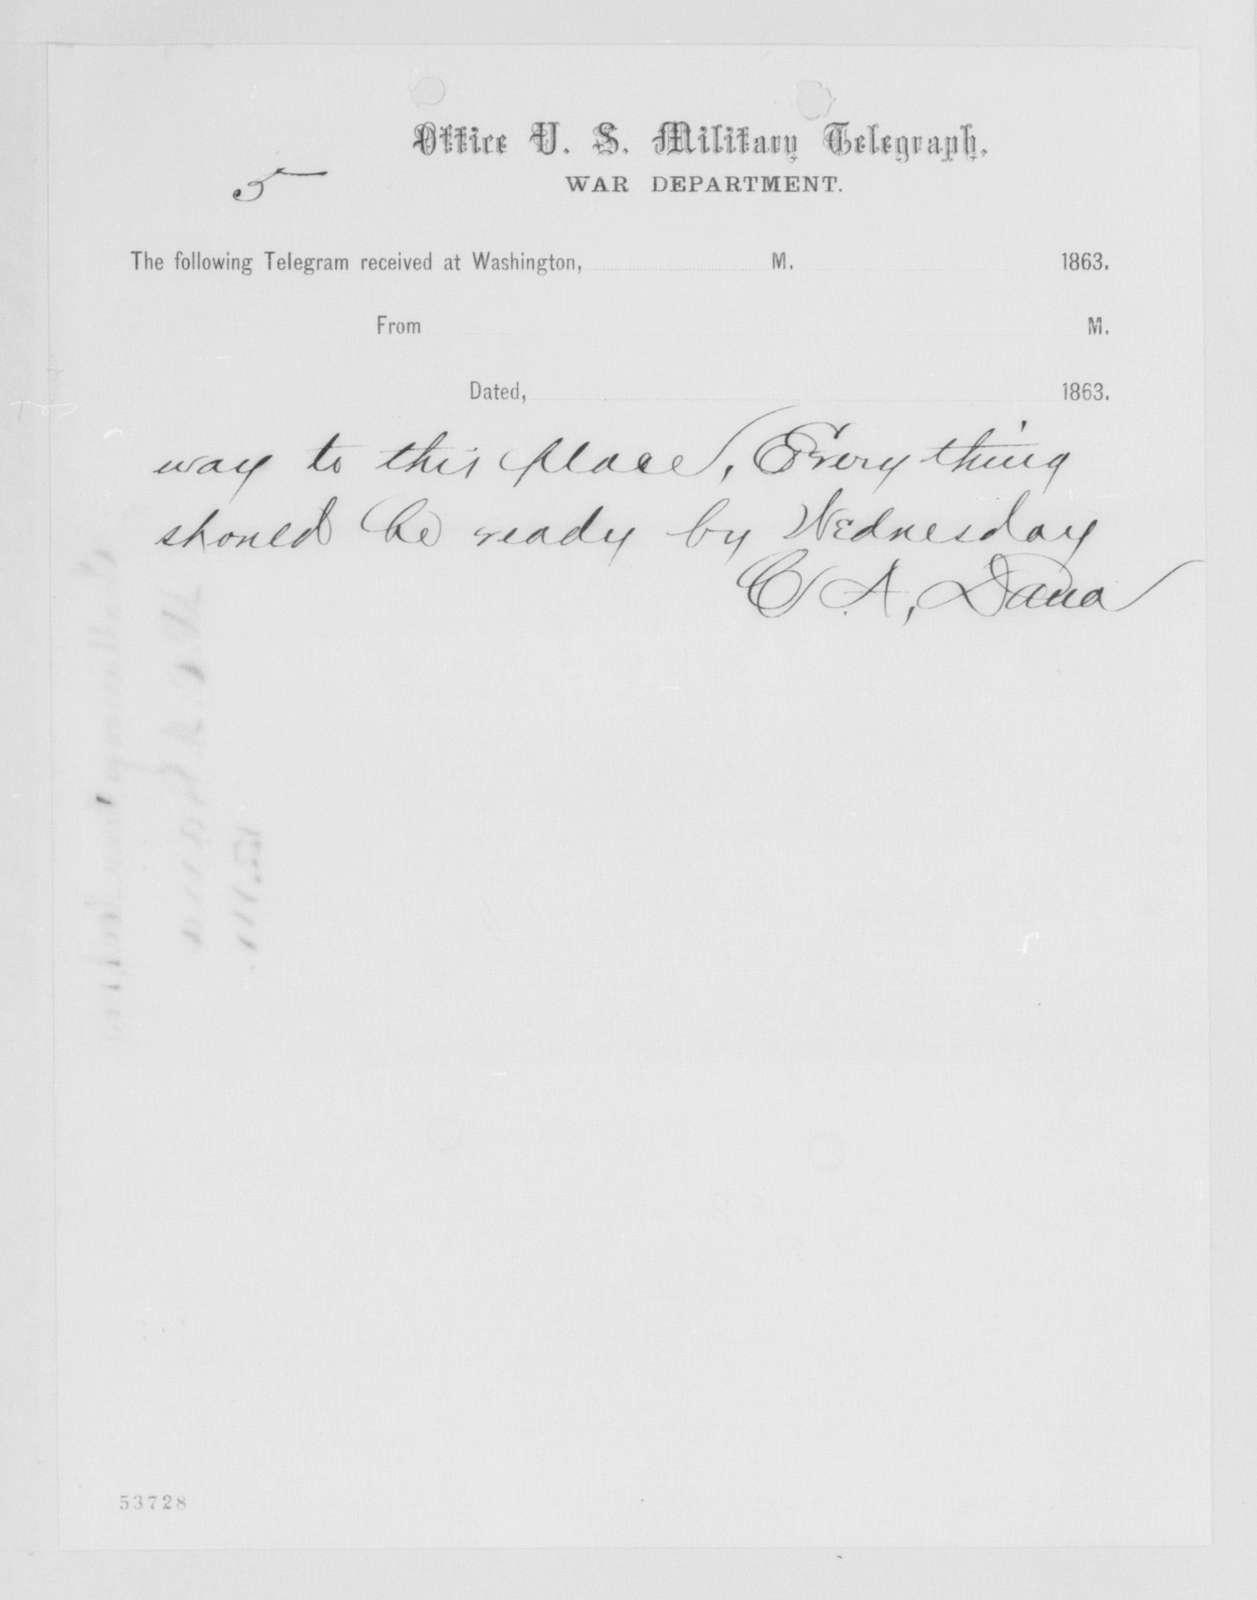 Edwin McMasters Stanton Papers: Correspondence, 1831-1870; 1863; 1863, Oct. 31-Nov. 27